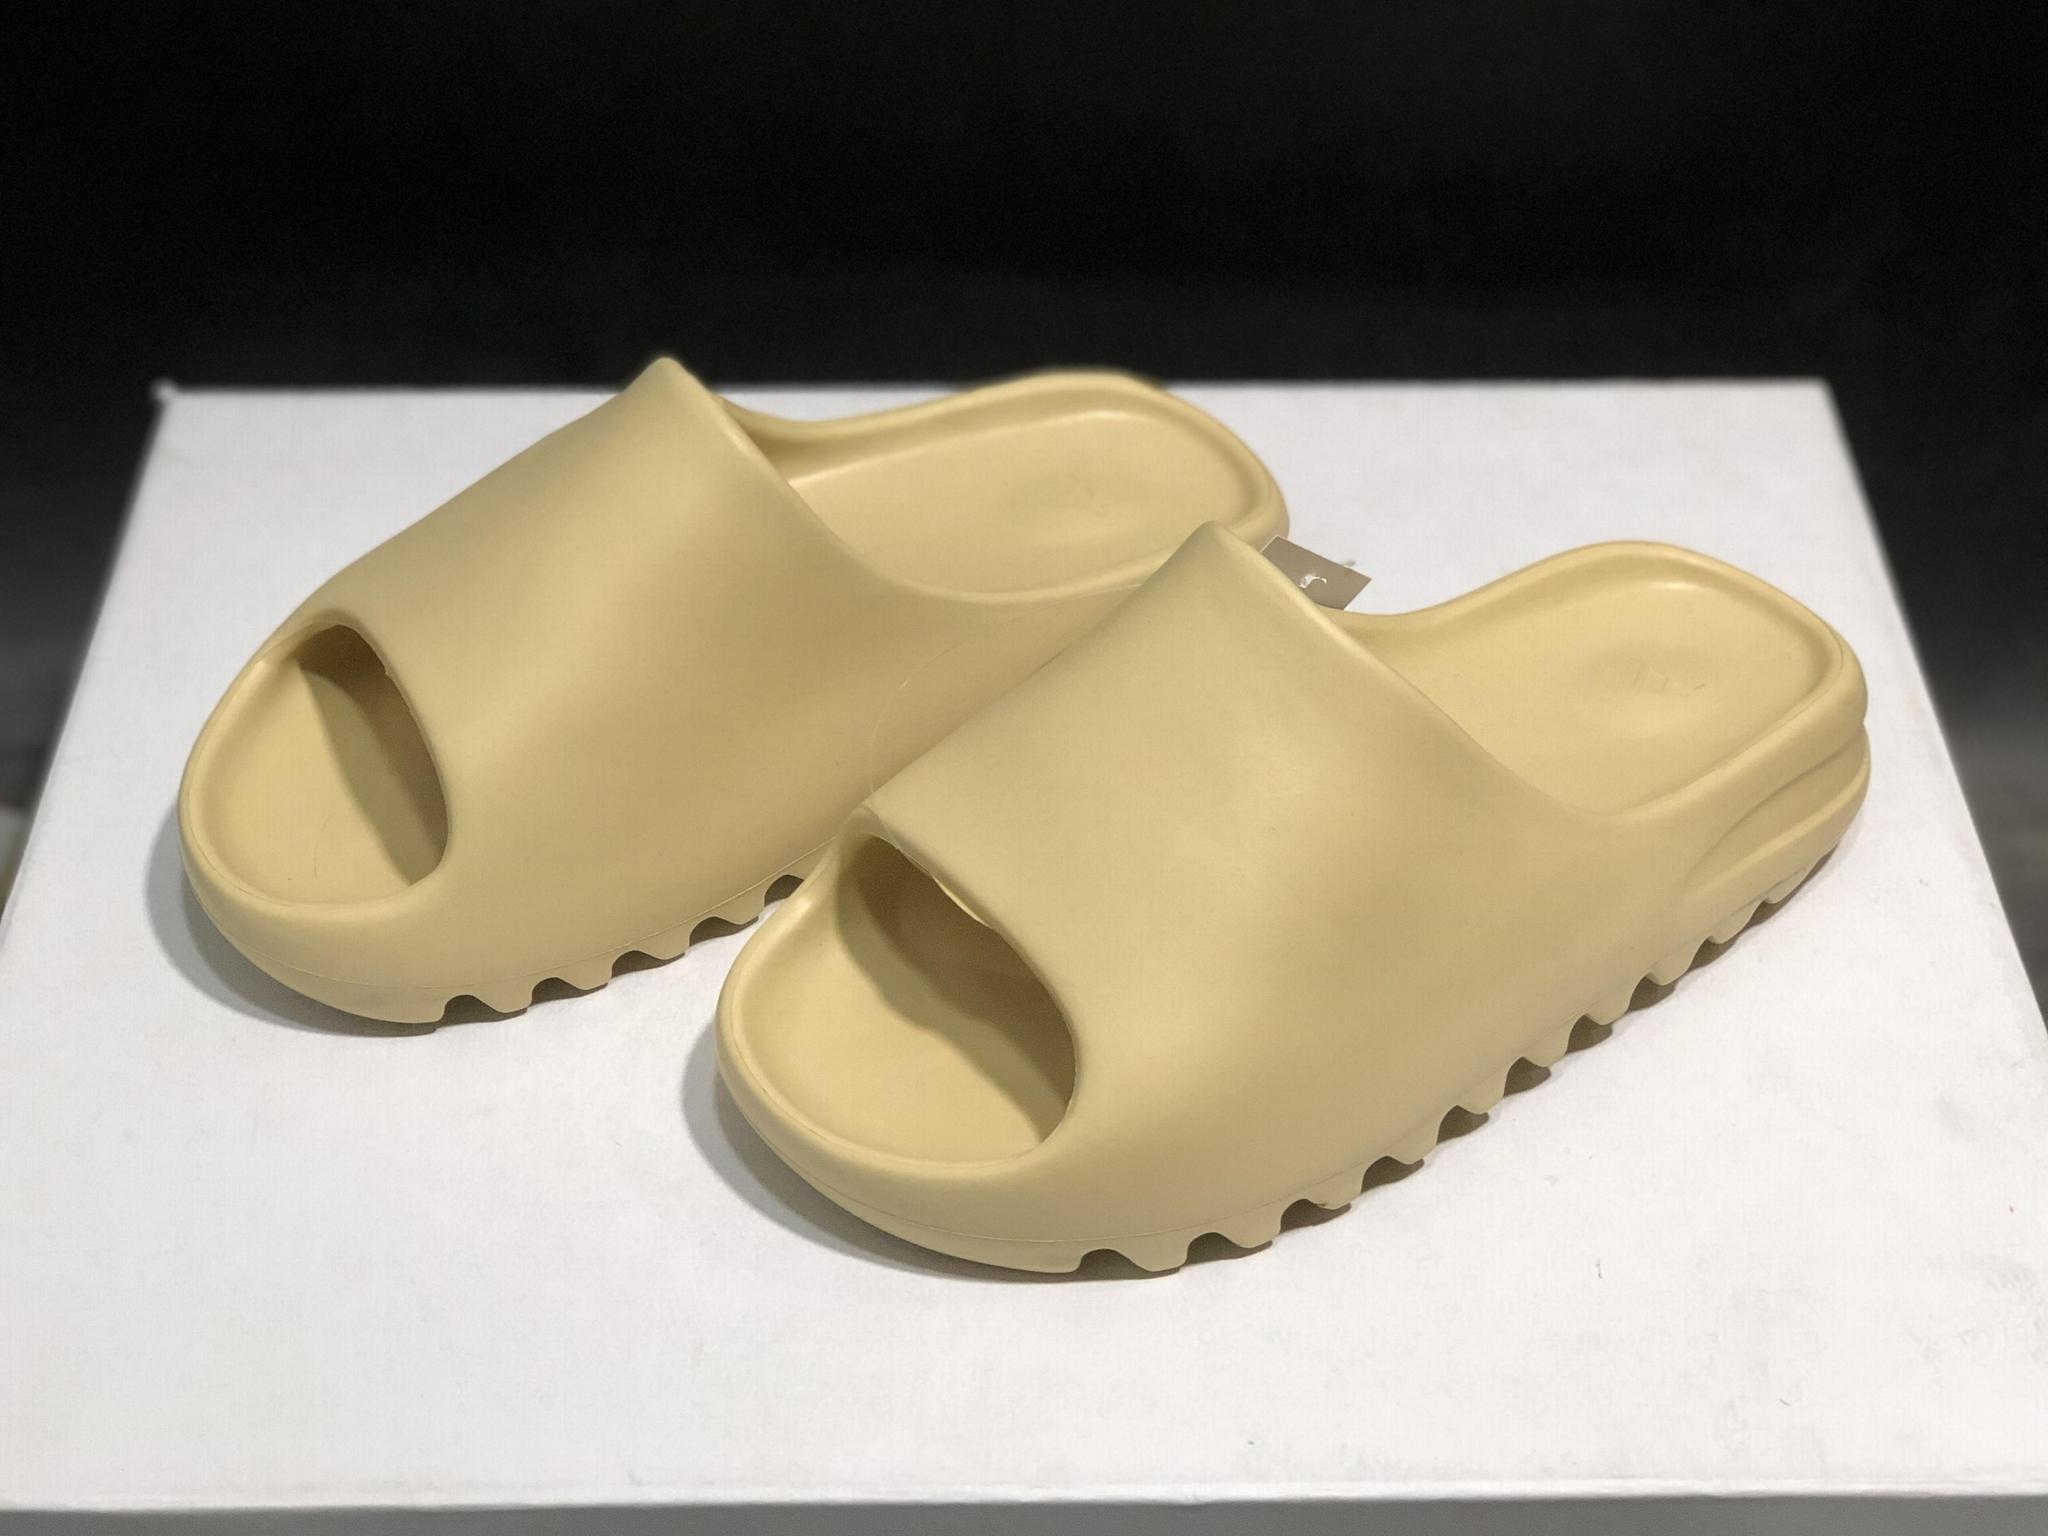 adidas Yeezy Slide Bone KANYE WEST slide cheap yeezy slipper